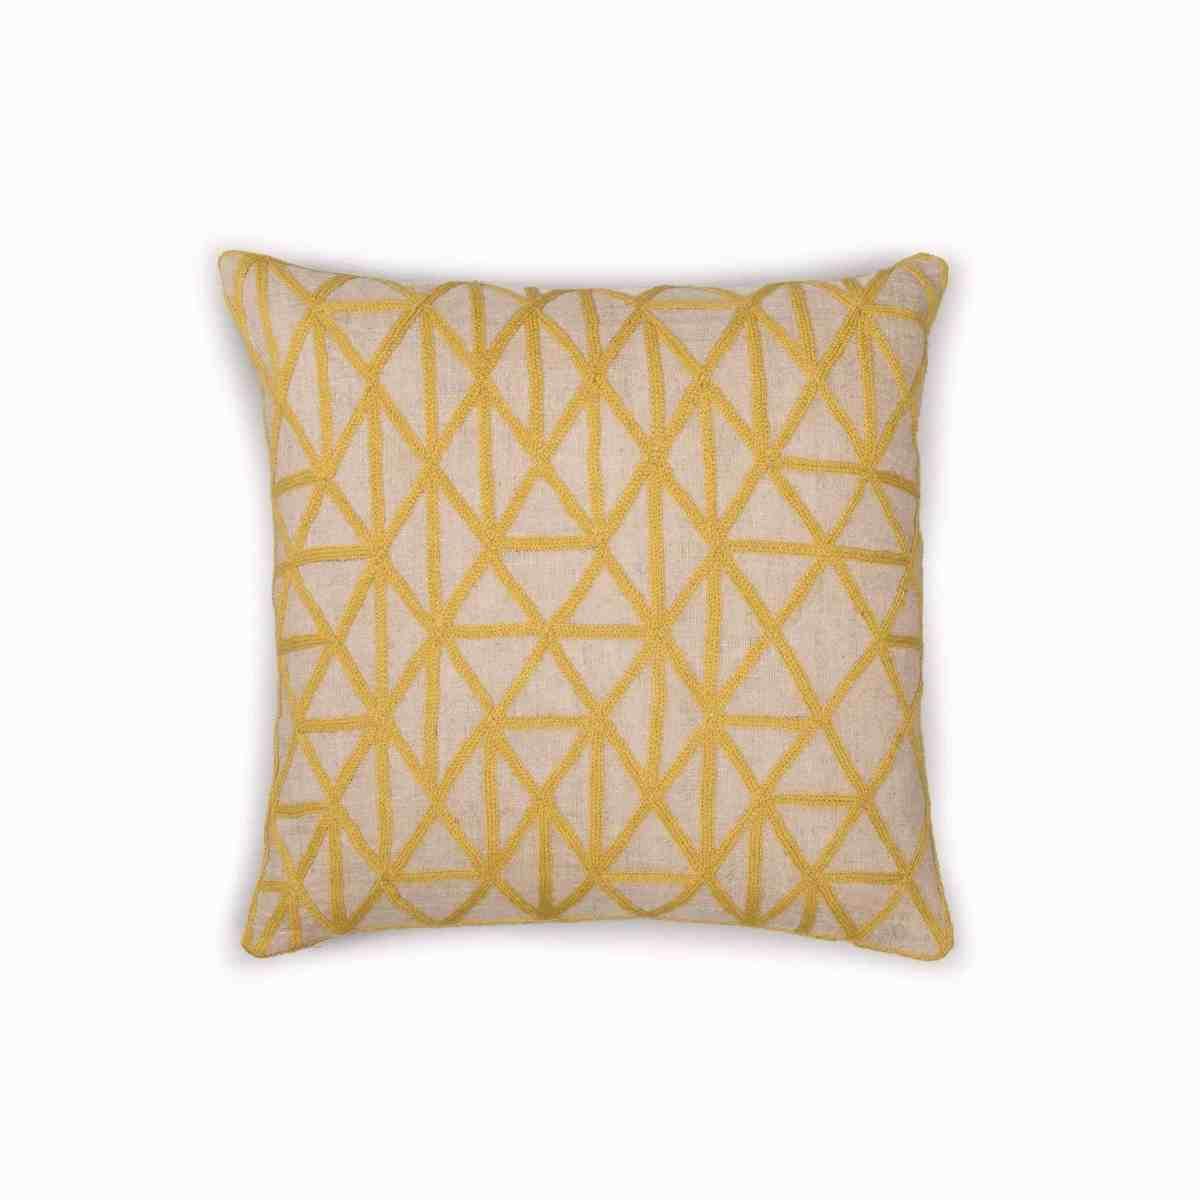 berber-cushion-chartreuse-natural-linen-2